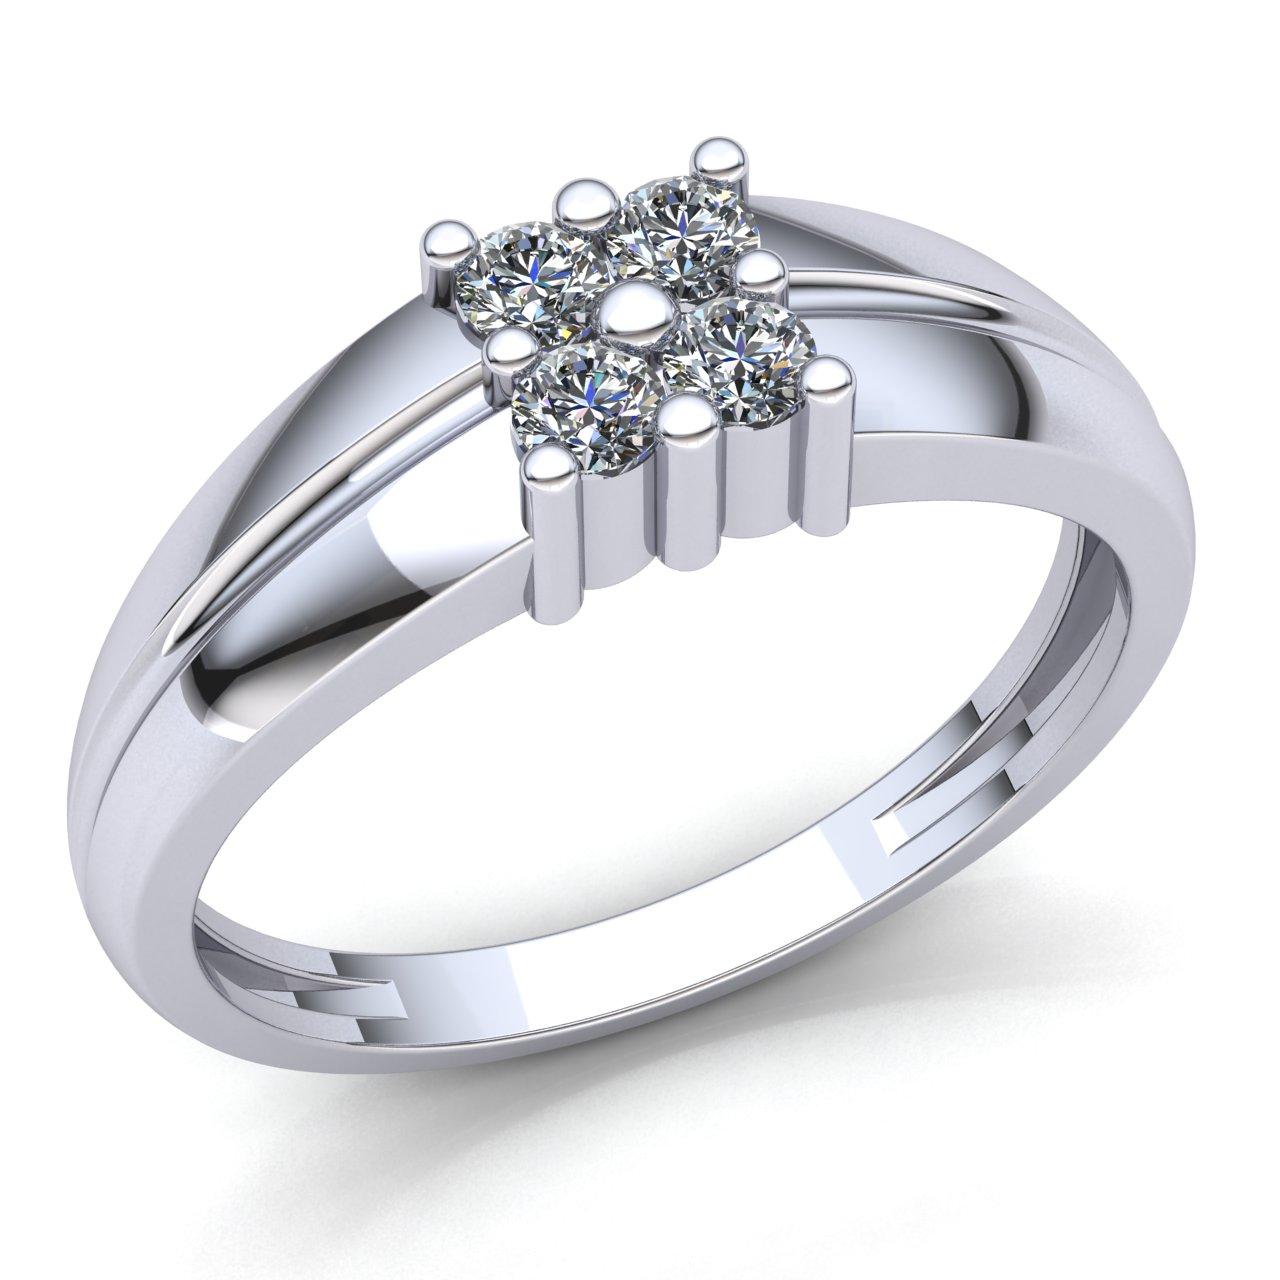 7dec9a8cf75e3 Details about Genuine 1.5ct Round Cut Diamond Mens Classic 4 Stone  Engagement Ring 18K Gold